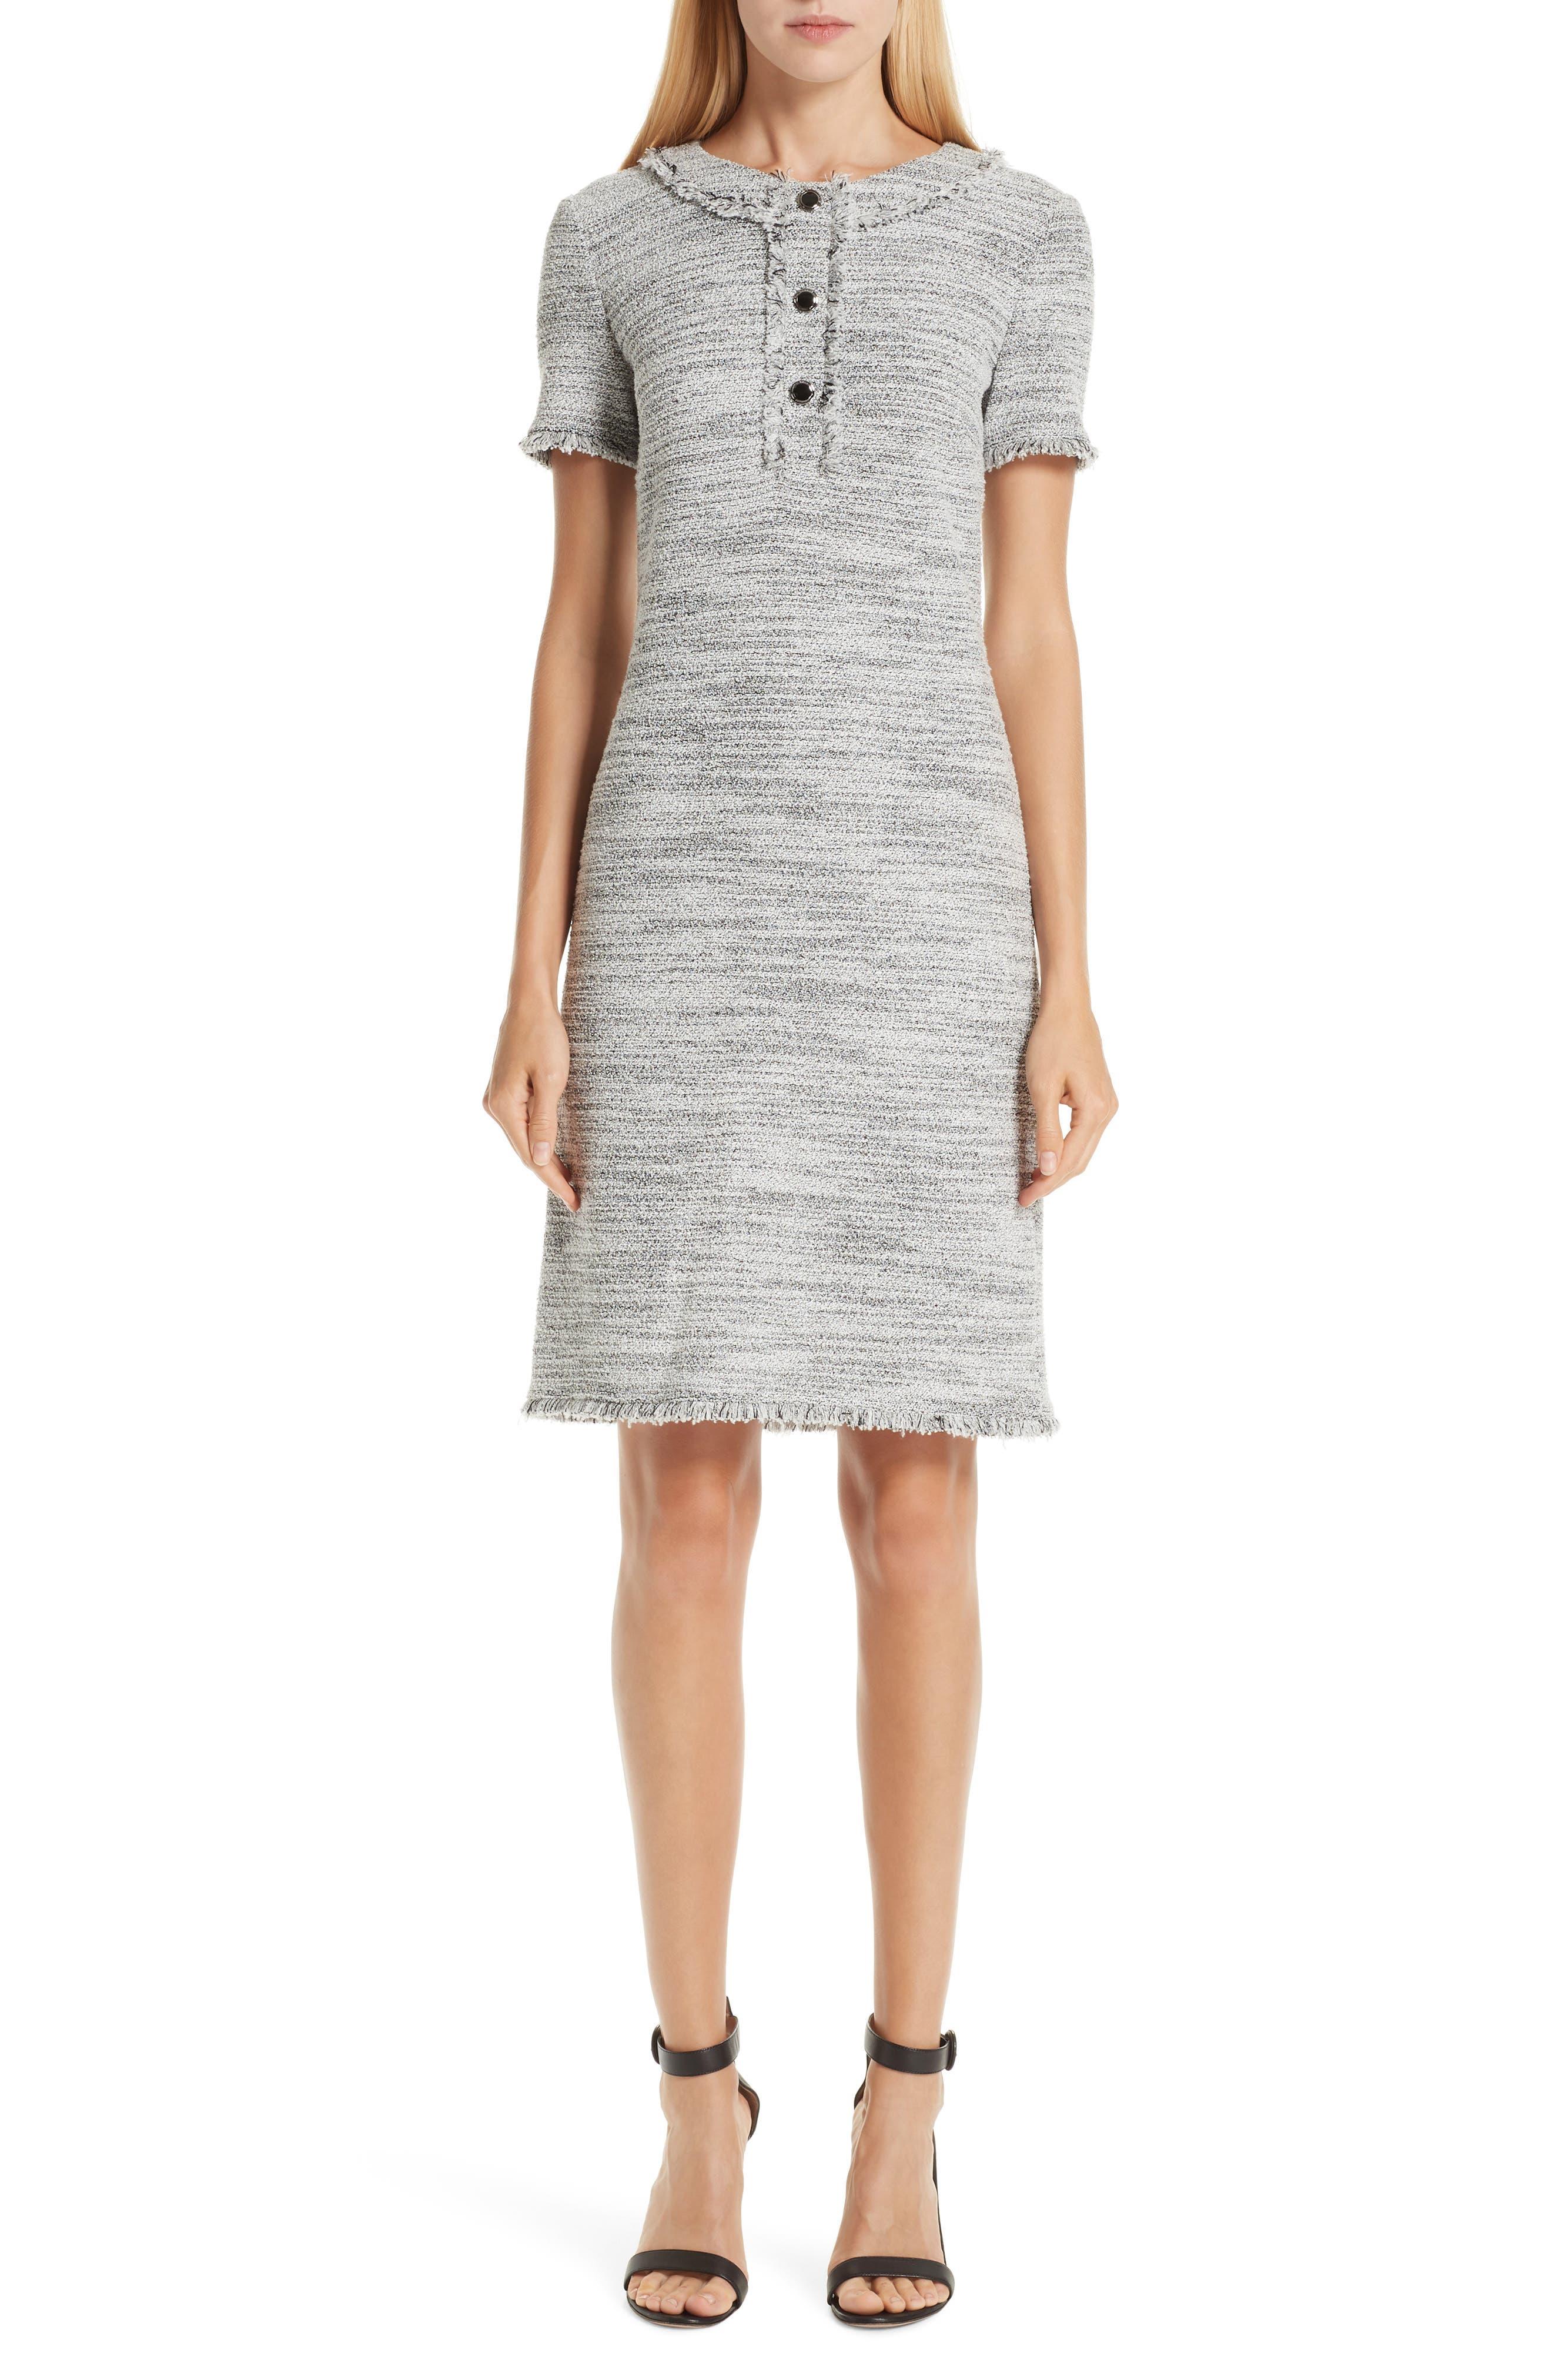 ST. JOHN COLLECTION, Eaton Place Tweed Knit Dress, Main thumbnail 1, color, CAVIAR/ CREAM